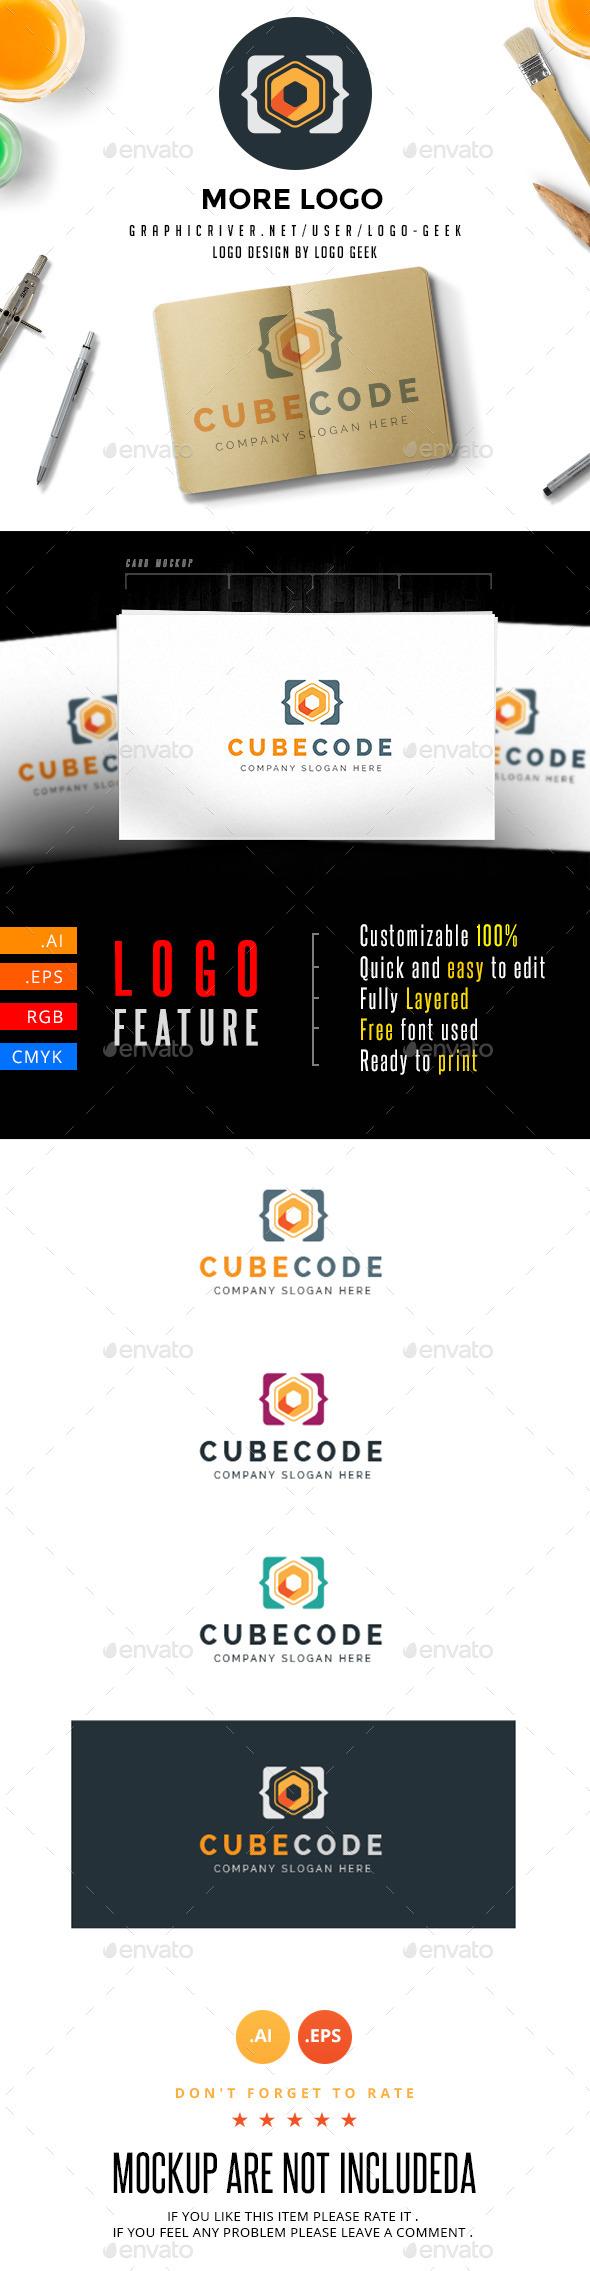 GraphicRiver Cube Code Logo 10741515